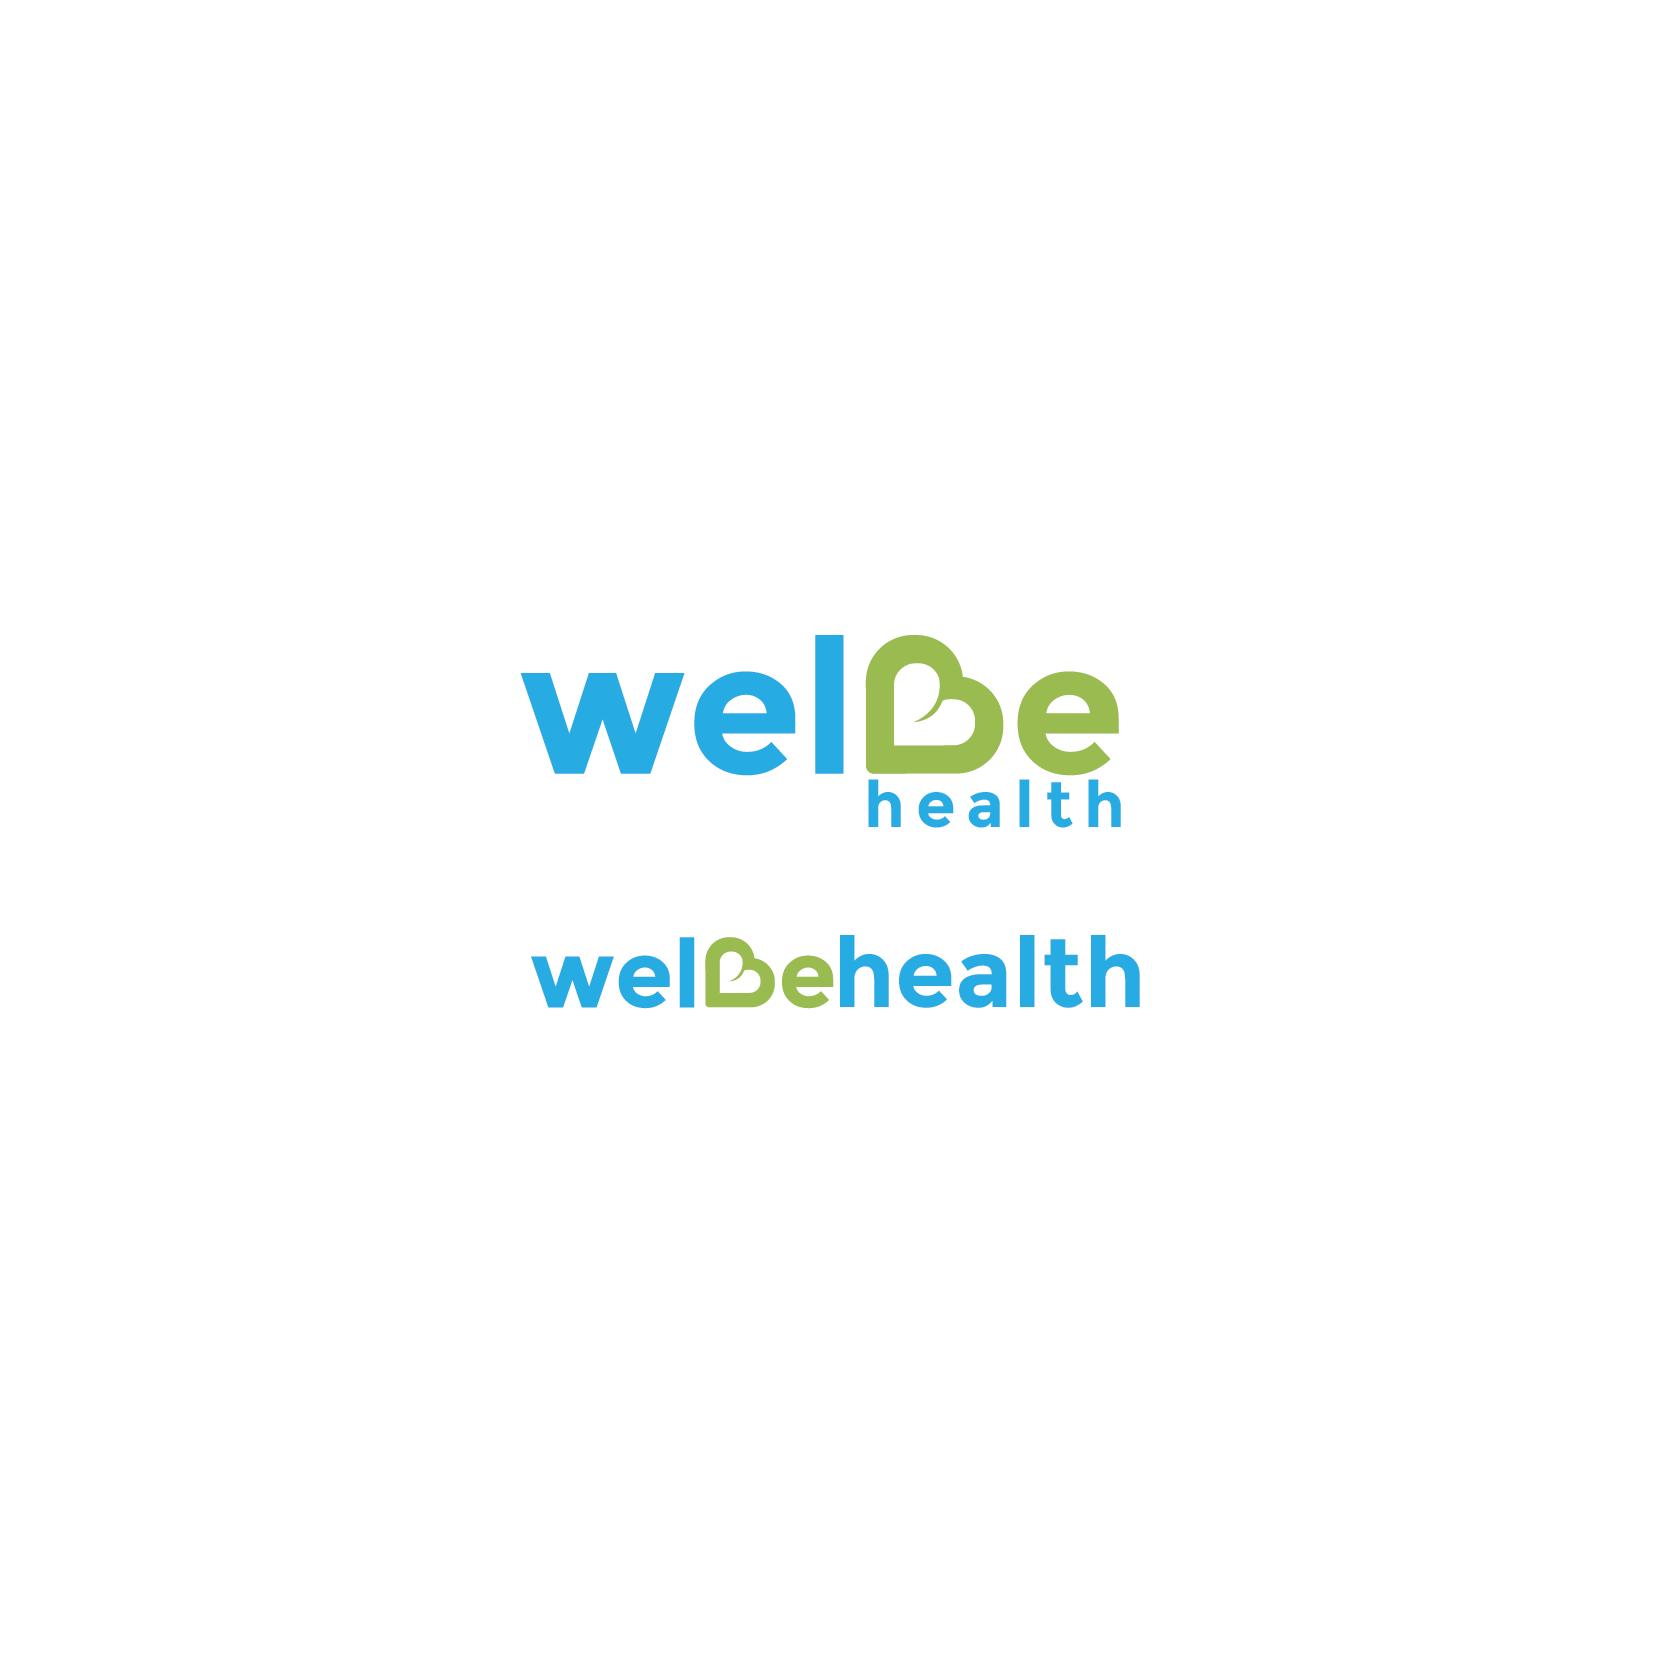 Logo design for WelbeHealth